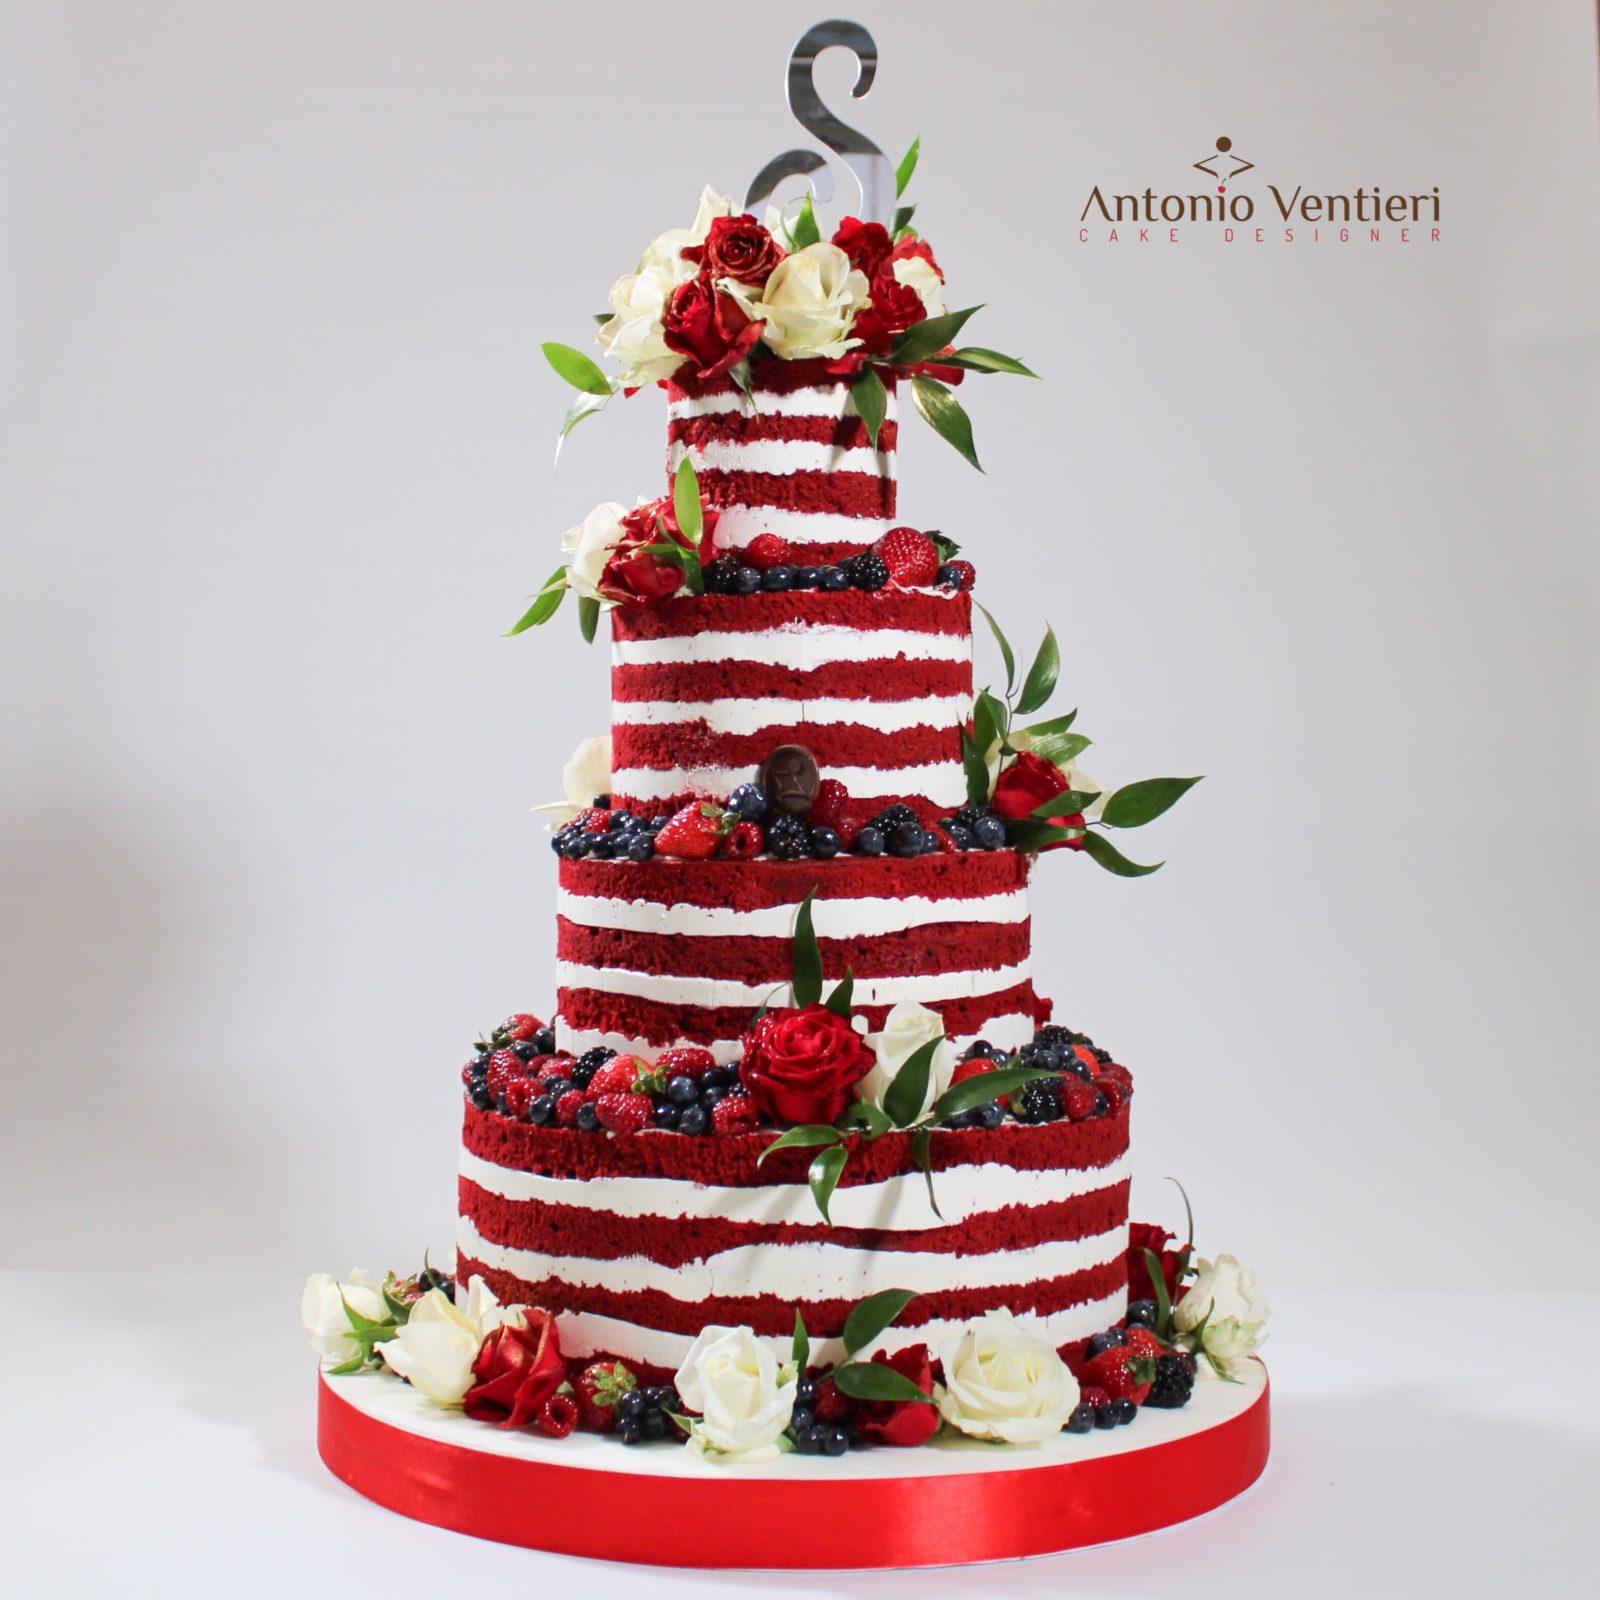 antonio ventieri, cake design, sposincampania, torta sposincampania, antonio ventieri cake design, sposi campania, sposi in campania, matrimoni campania, matrimonio campania, torte campania, antonio ventieri cake design capaccio paestum